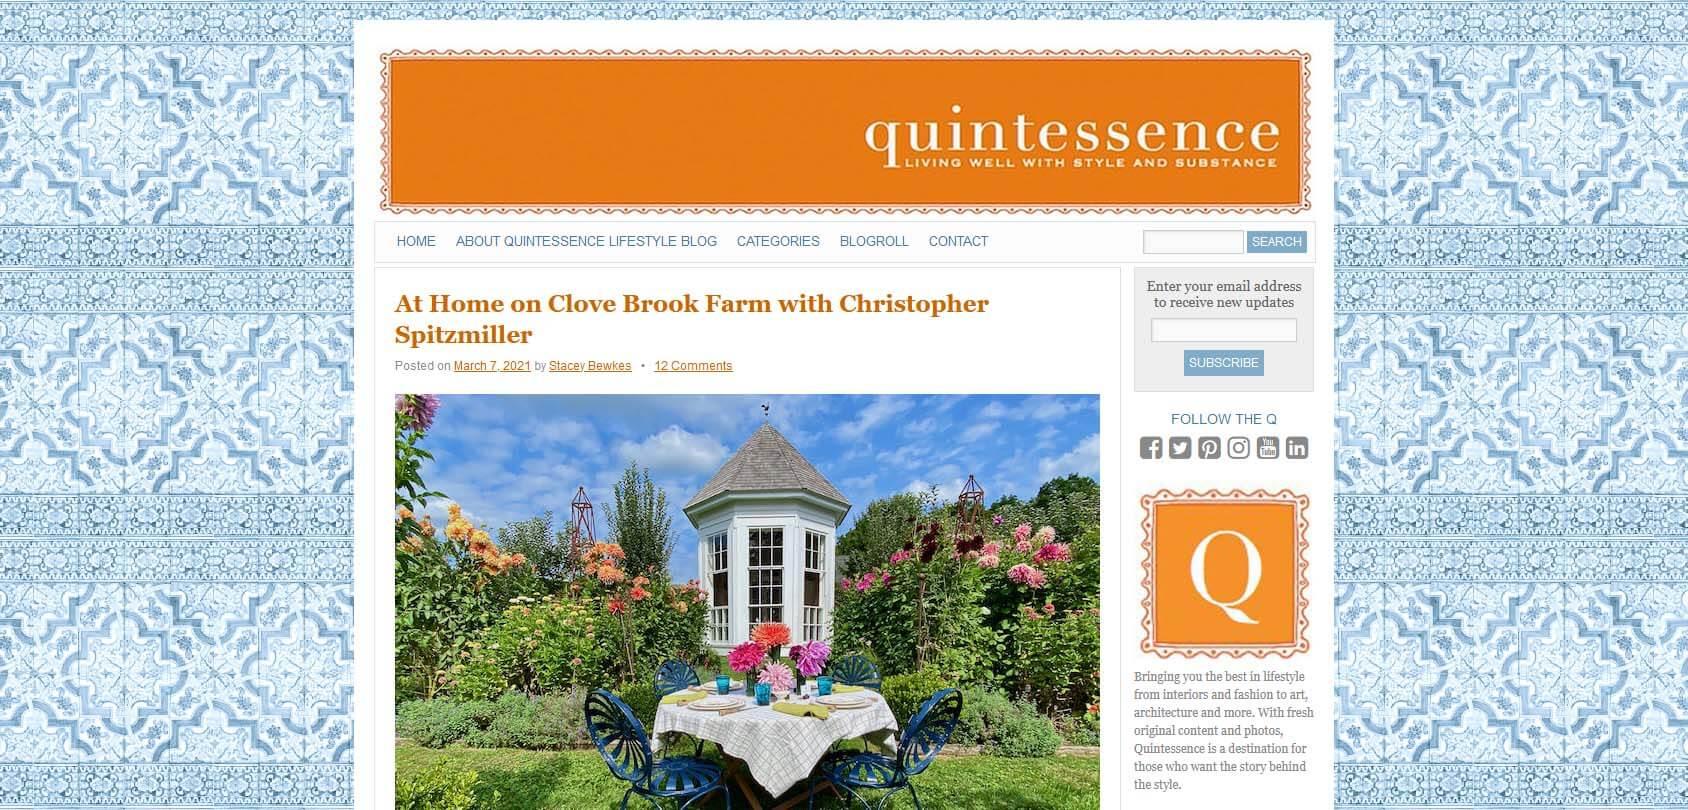 Quintessence Homepage